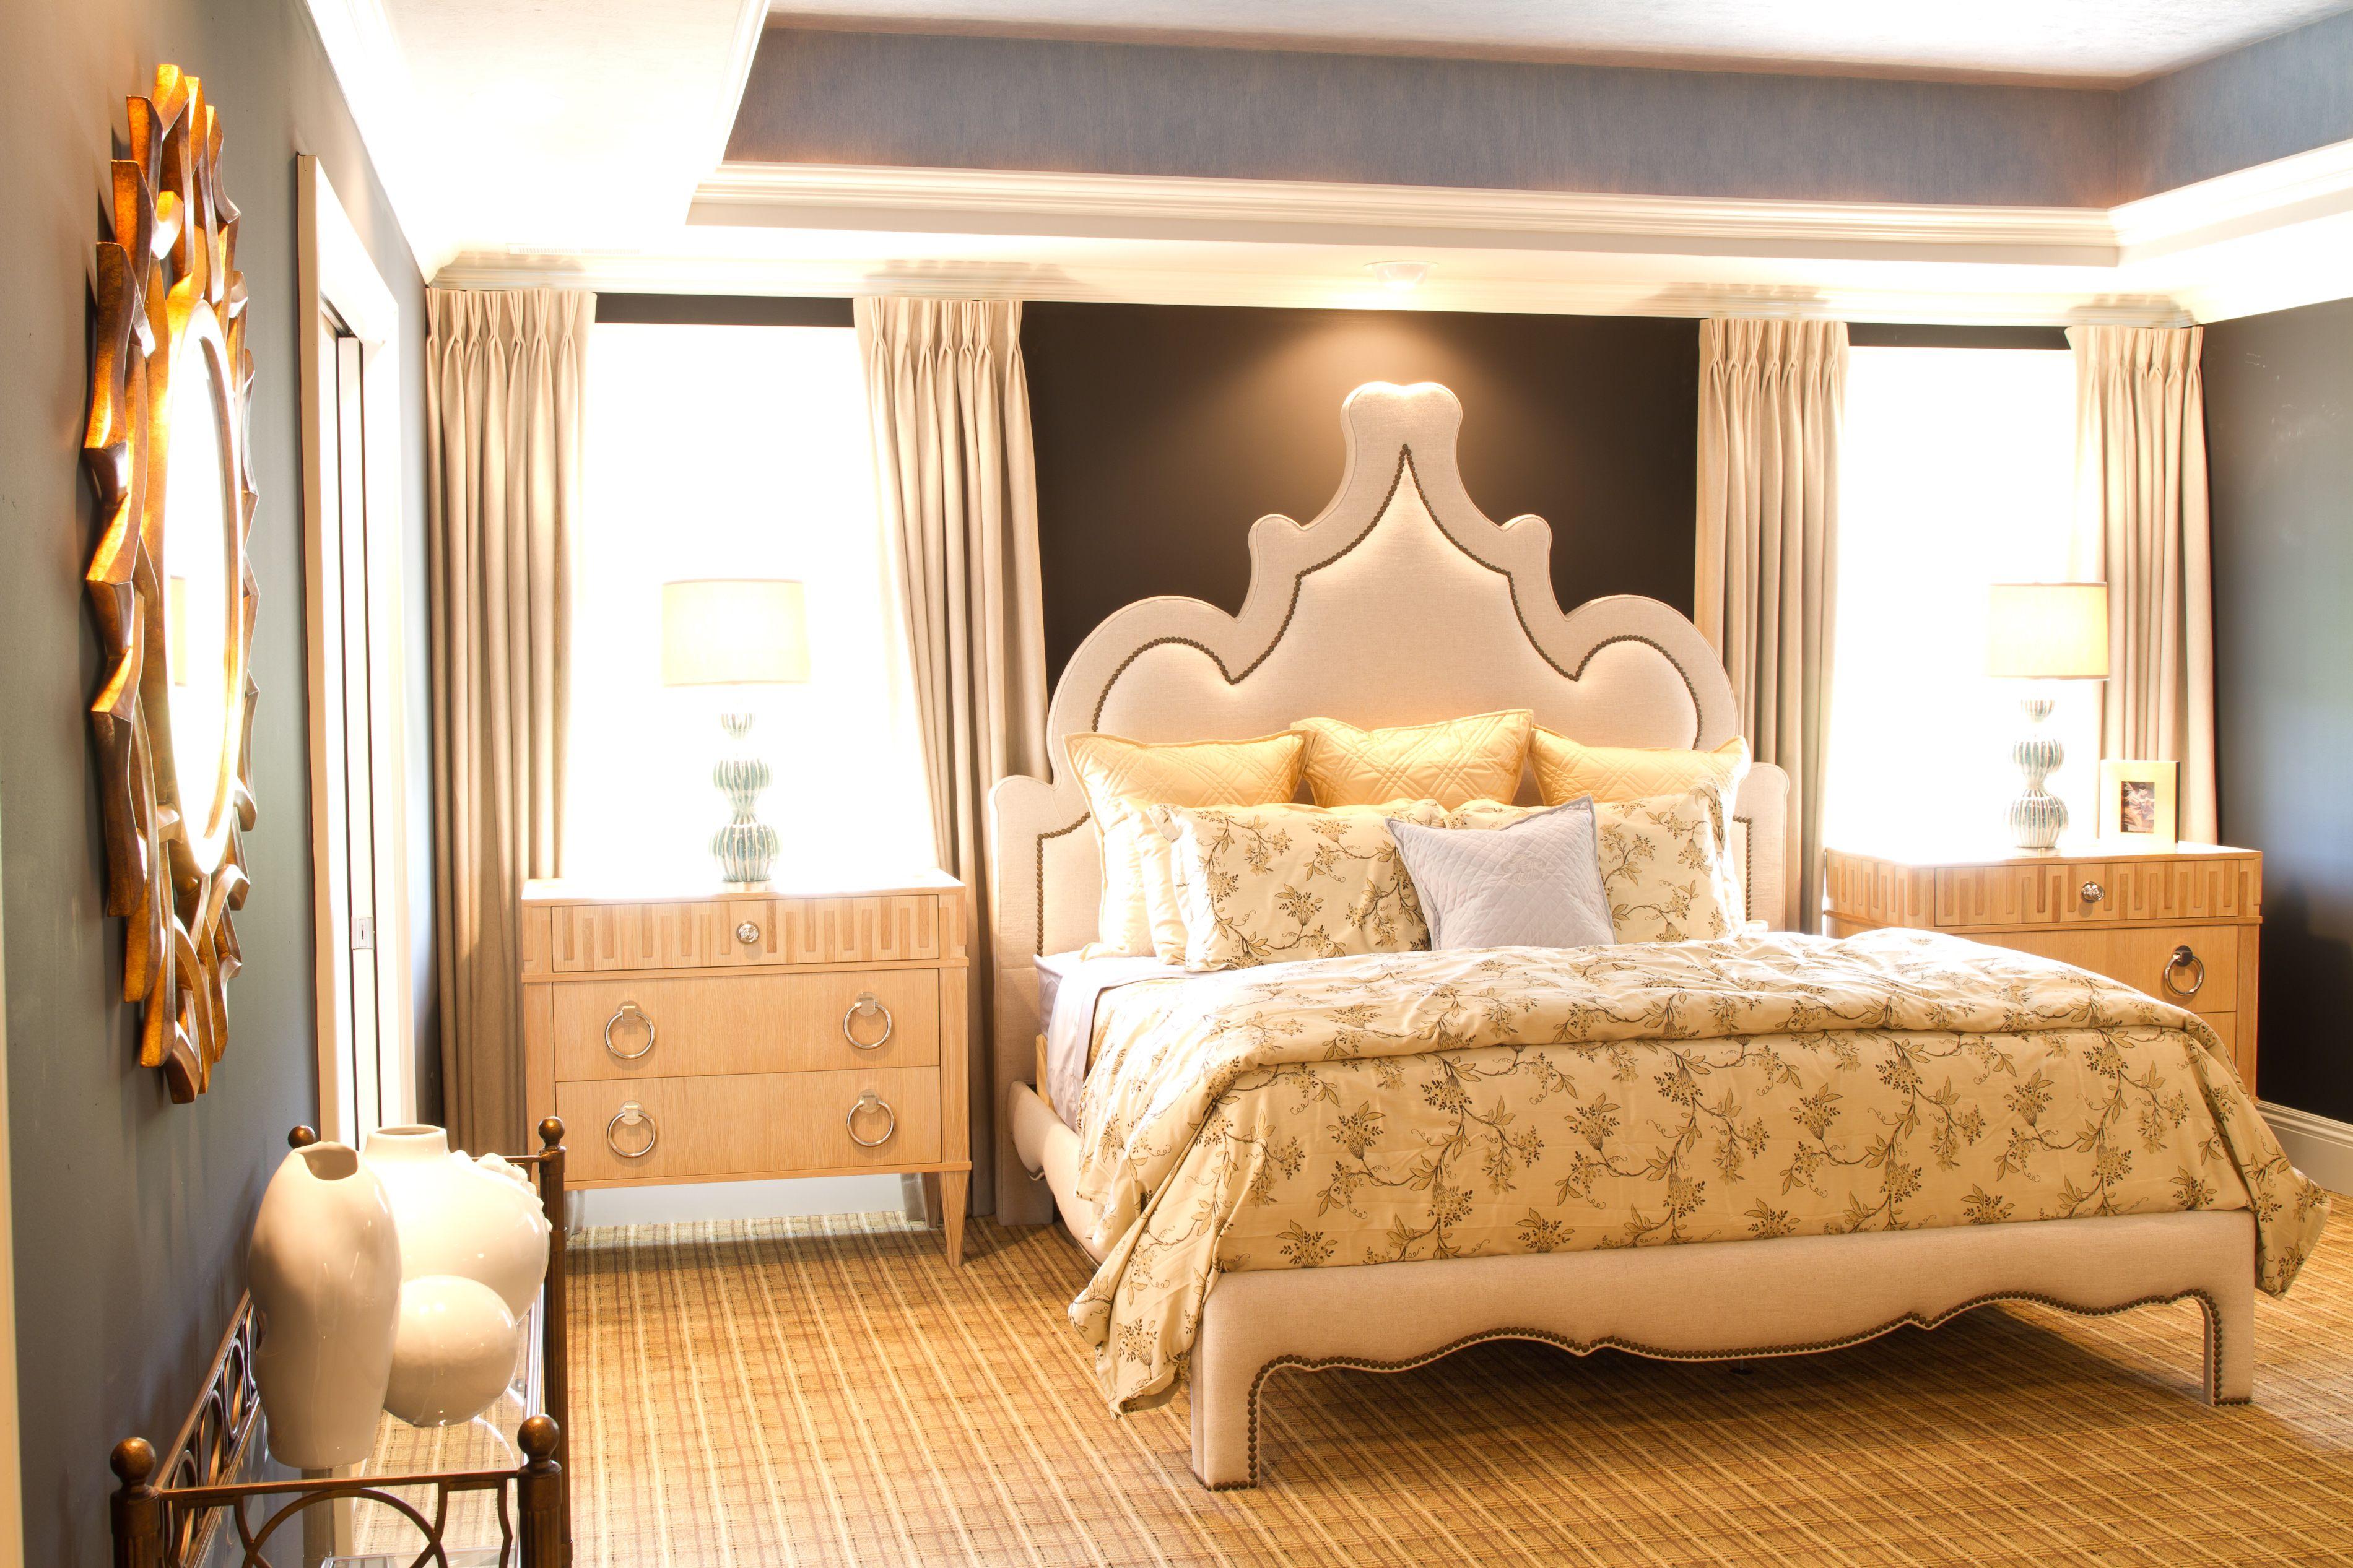 Joe Berkowitz Designed This Bedroom For Hgtv S Show House